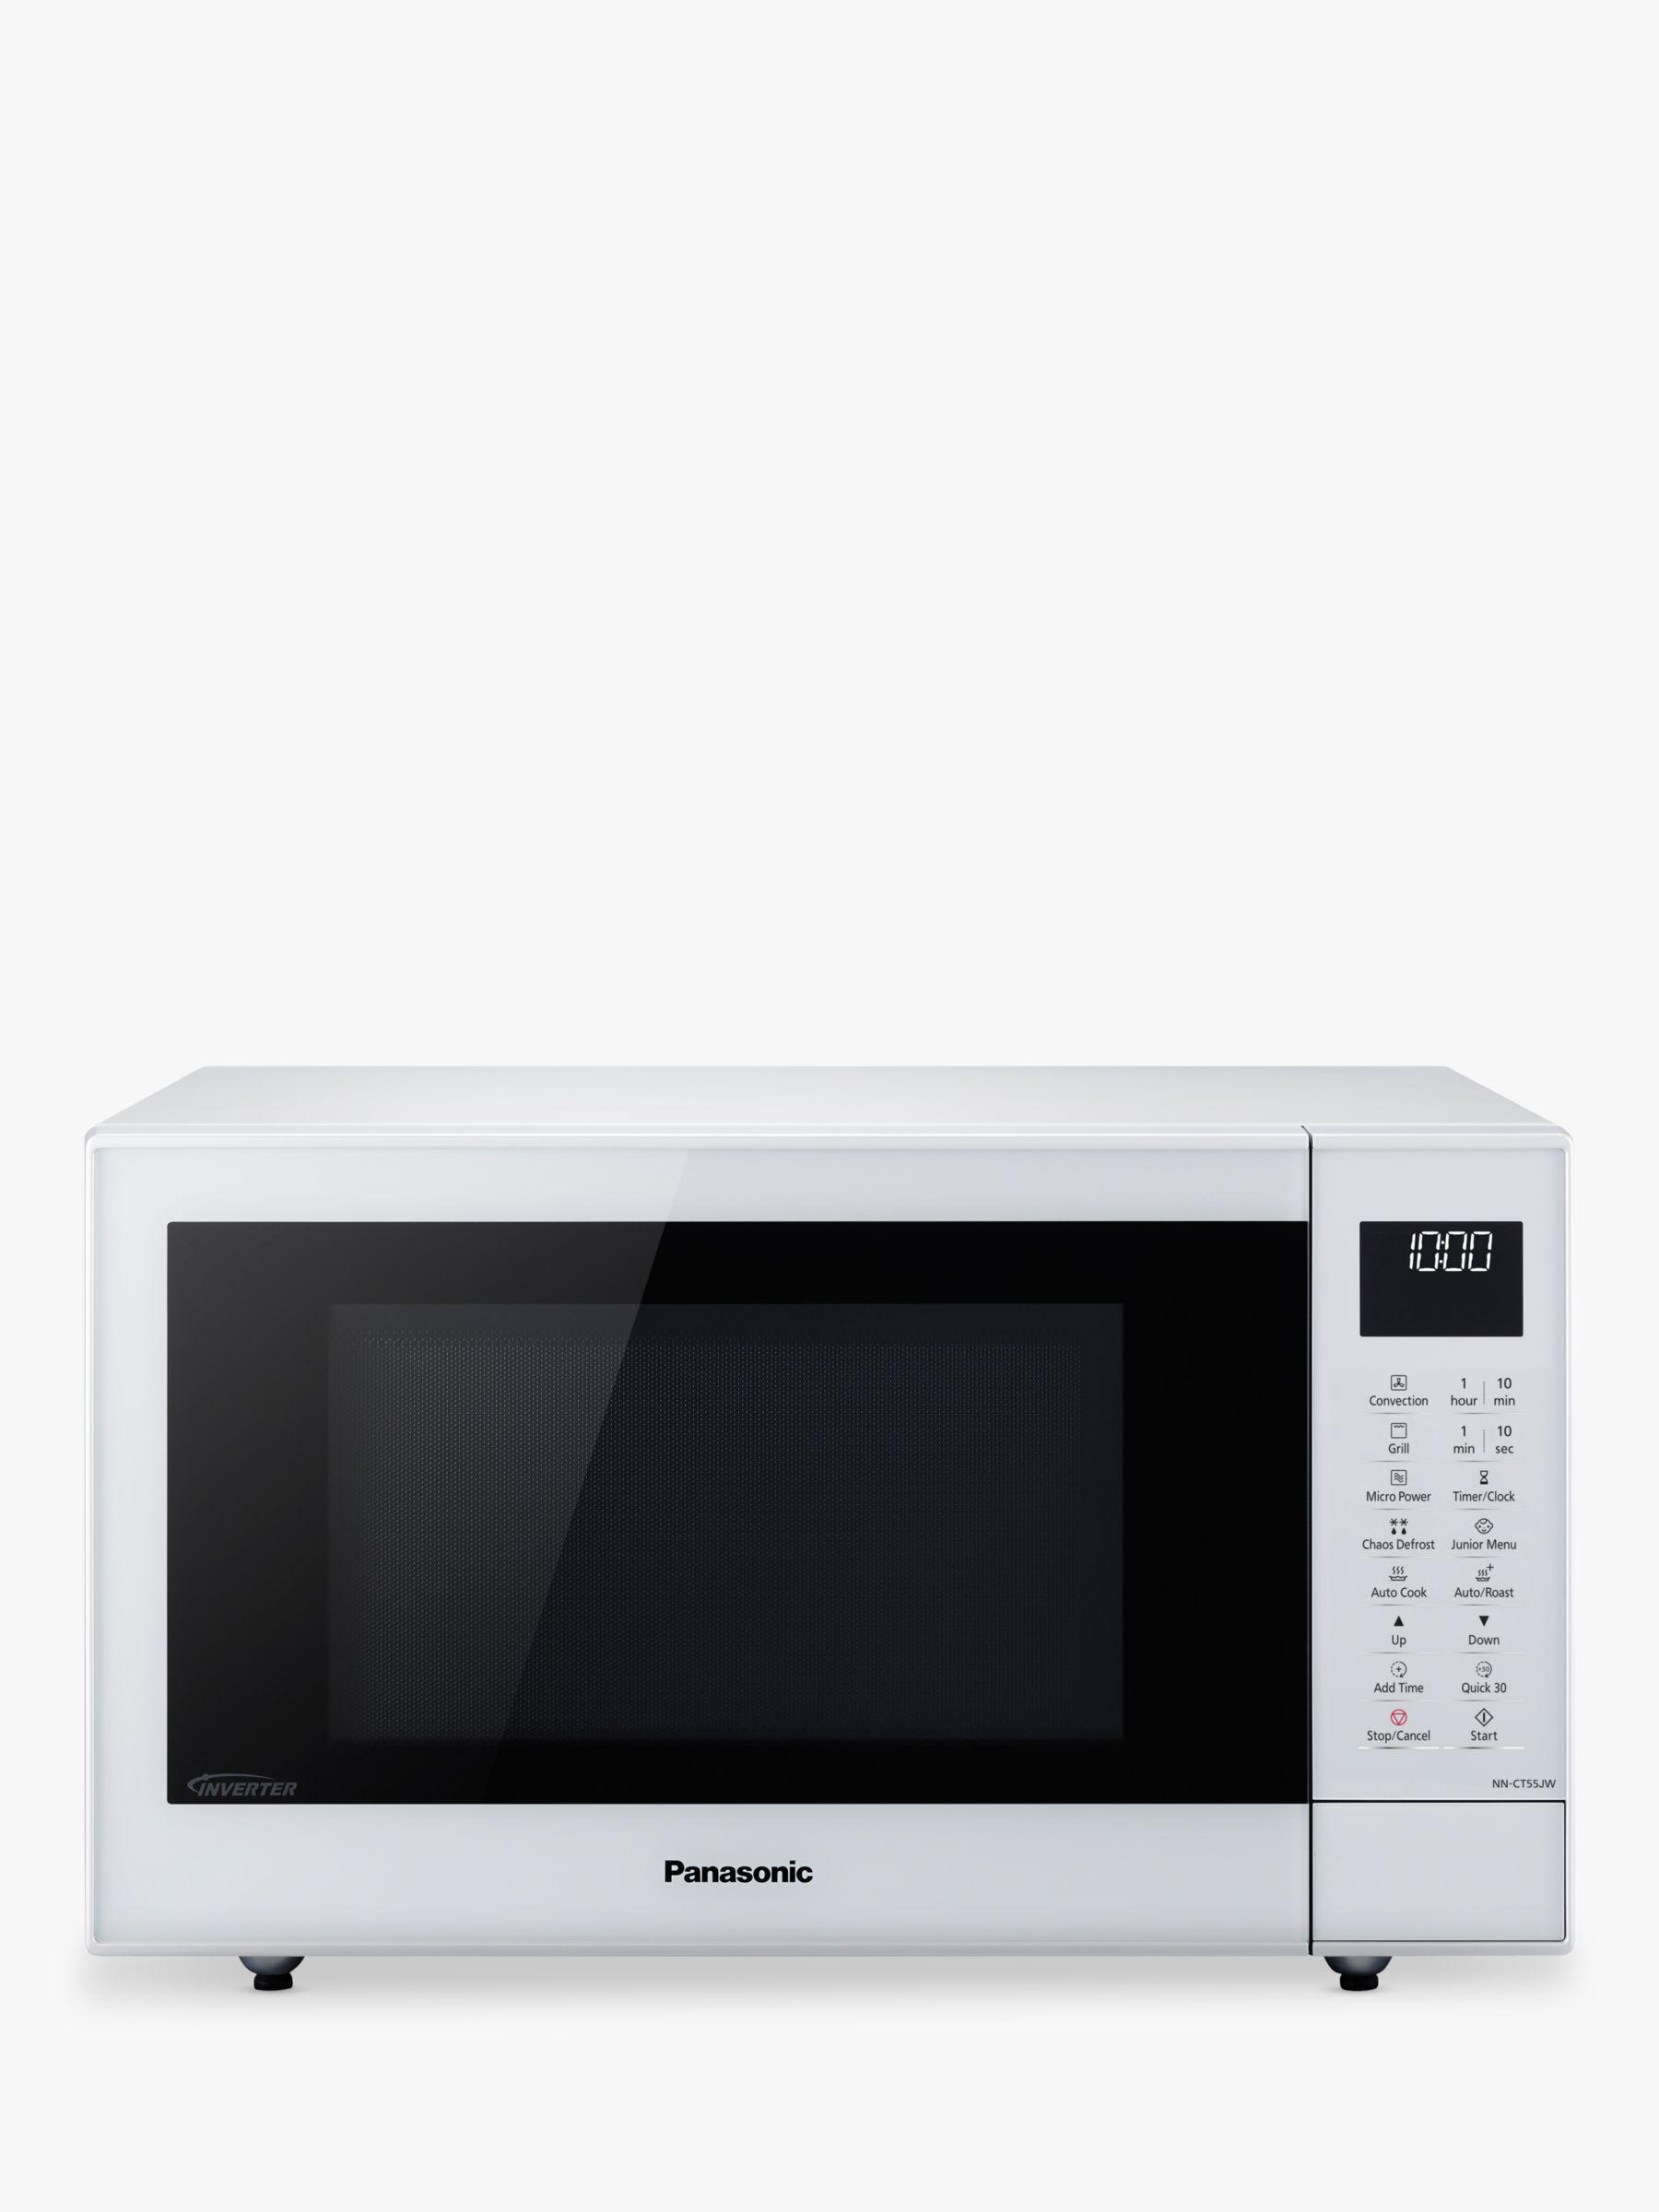 Panasonic Panasonic NN-CT55JWBPQ 27L Slimline Combination Microwave Oven, White